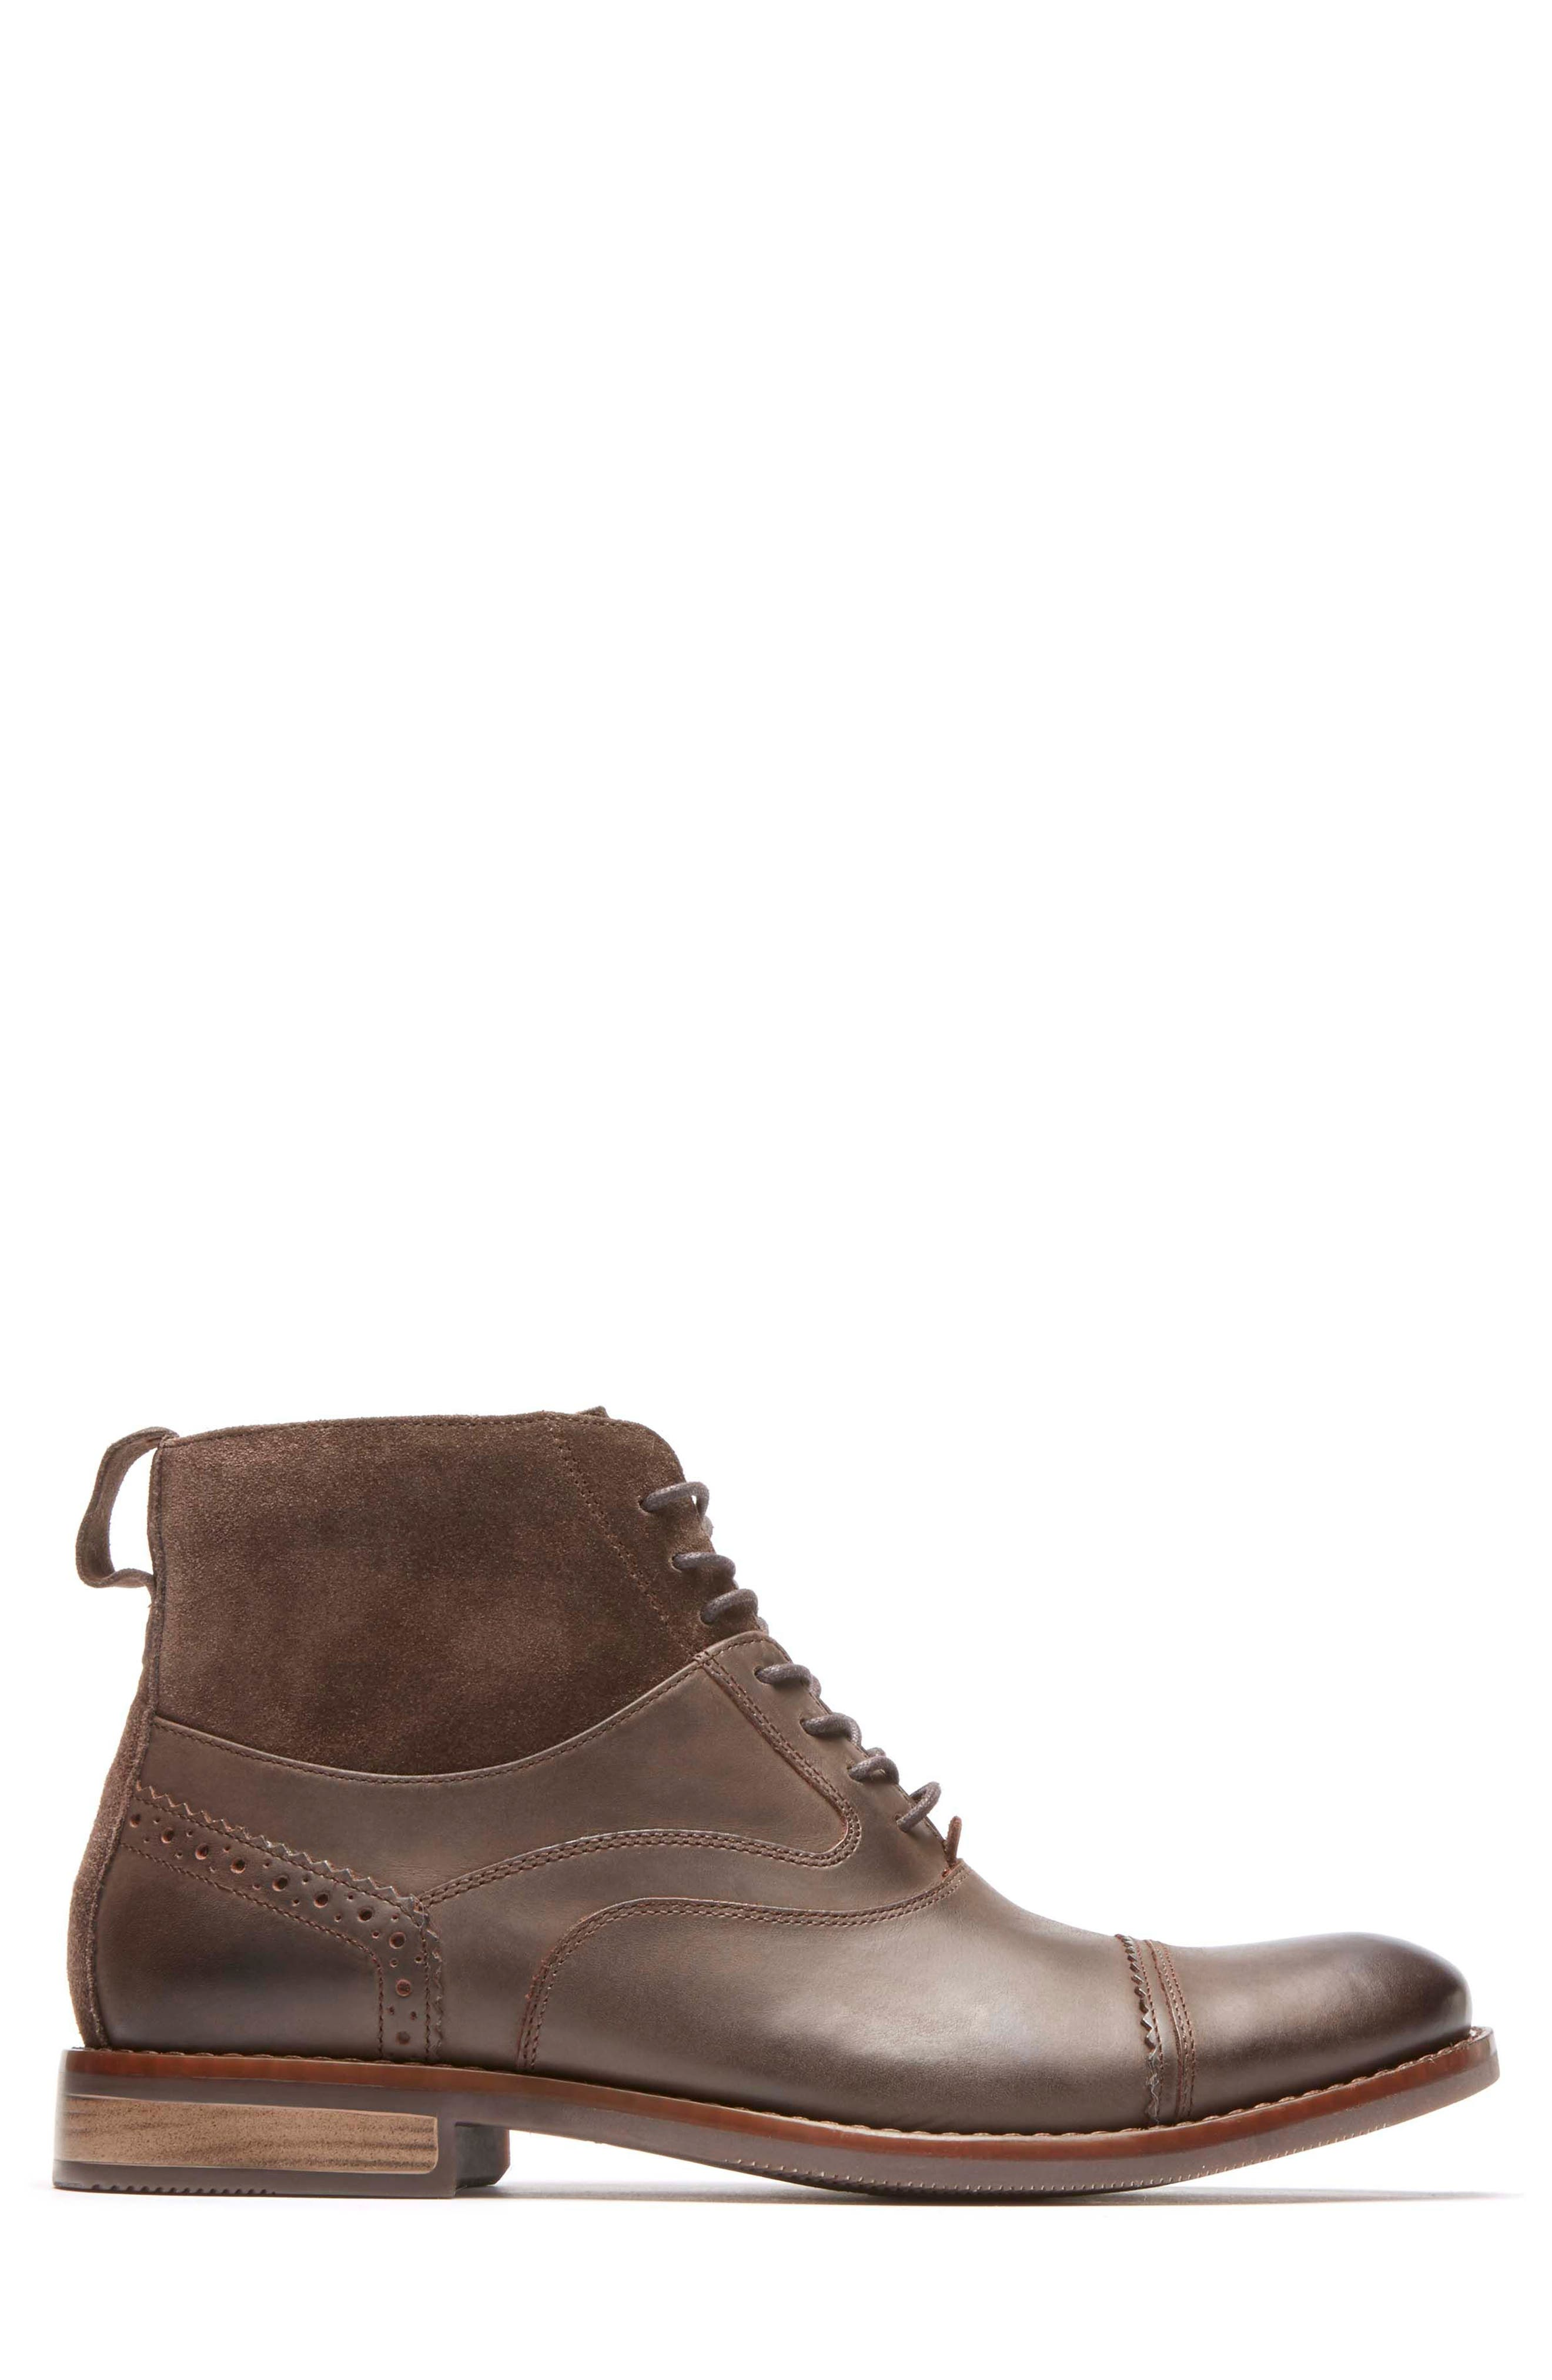 Wynstin Cap Toe Boot,                             Alternate thumbnail 3, color,                             Dark Chocolate Leather